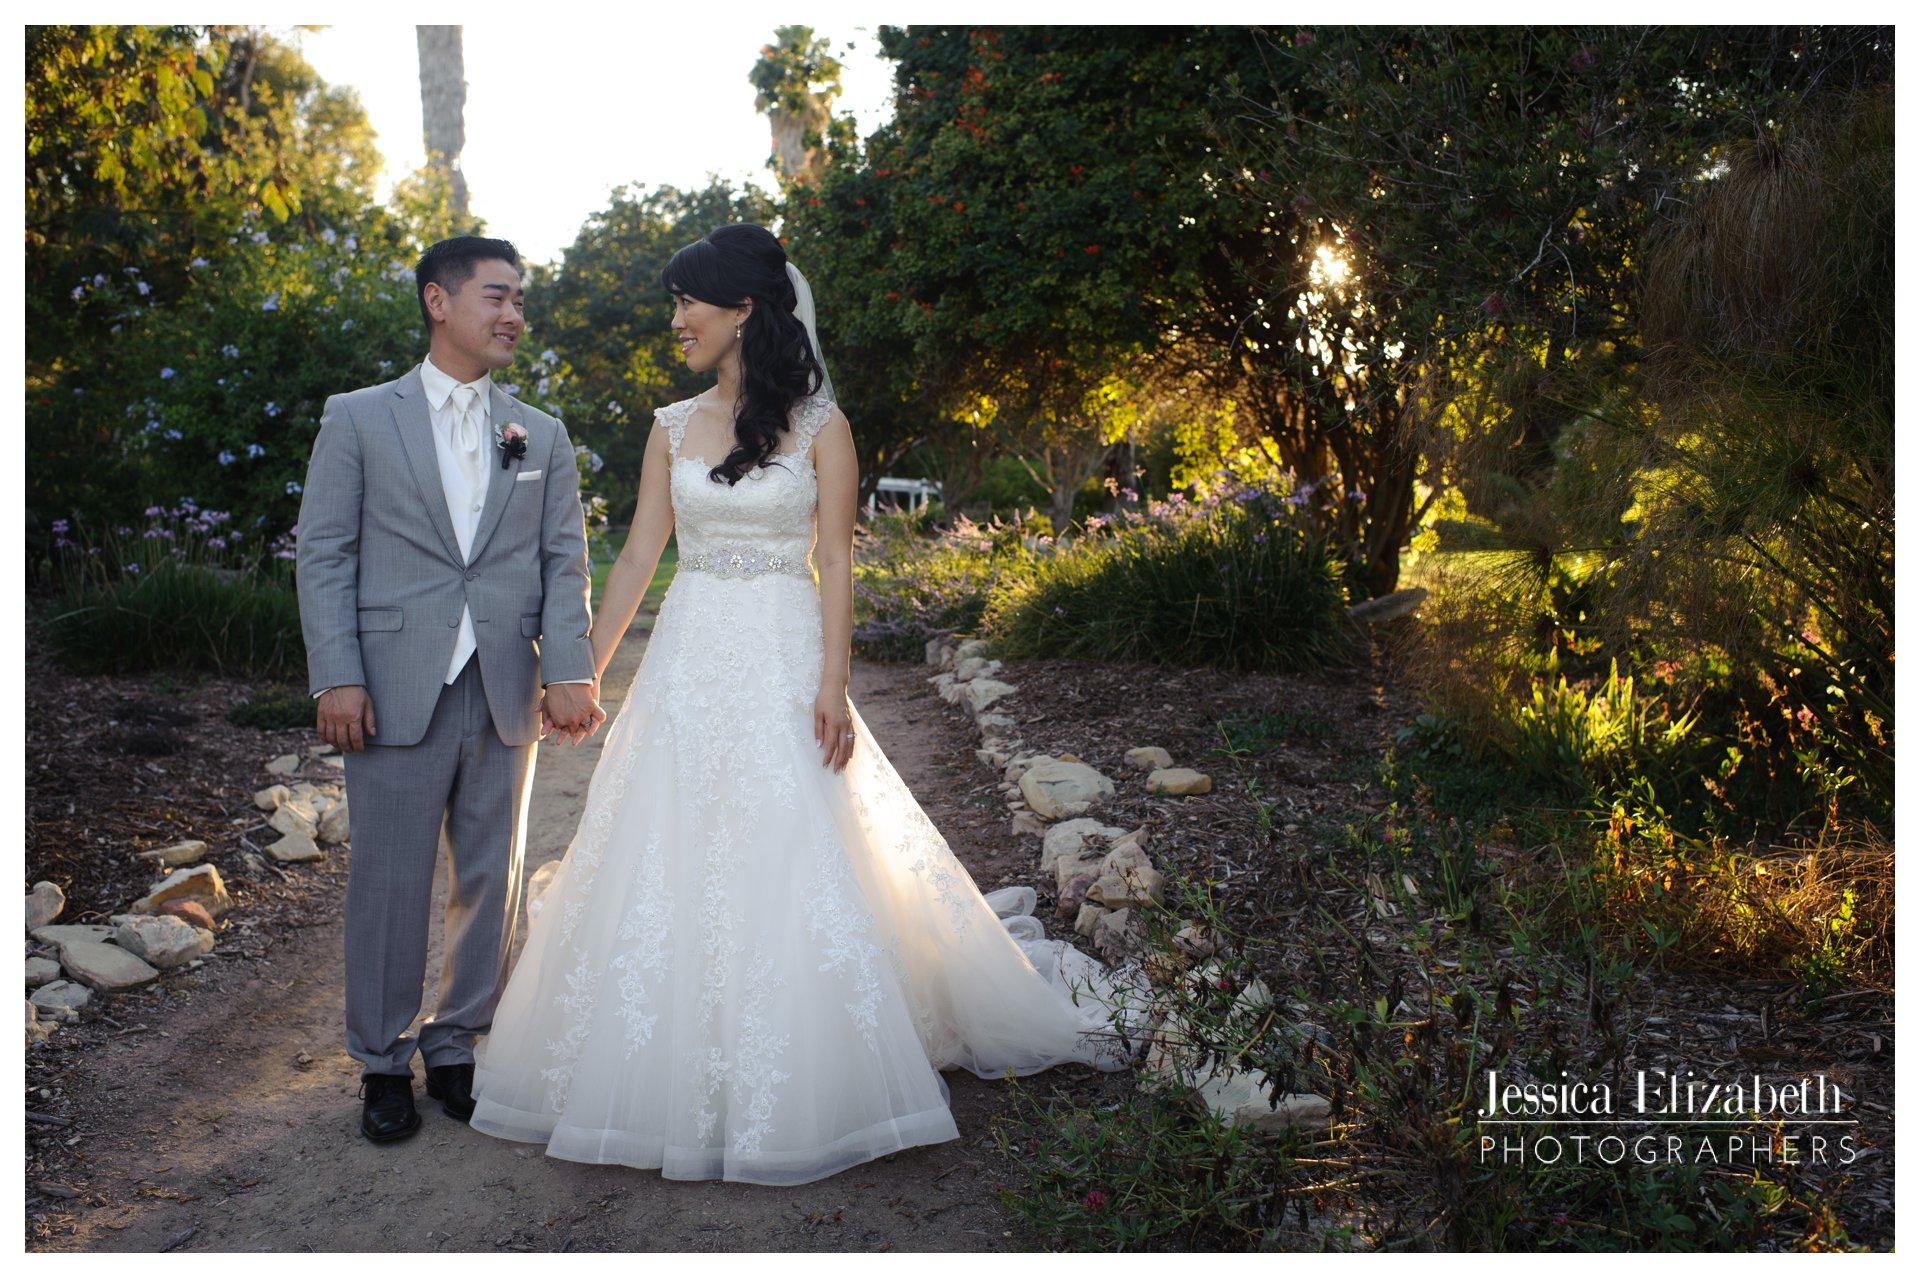 31-South Coast Botanic Garden Palos Verdes Wedding Photography by Jessica Elizabeth